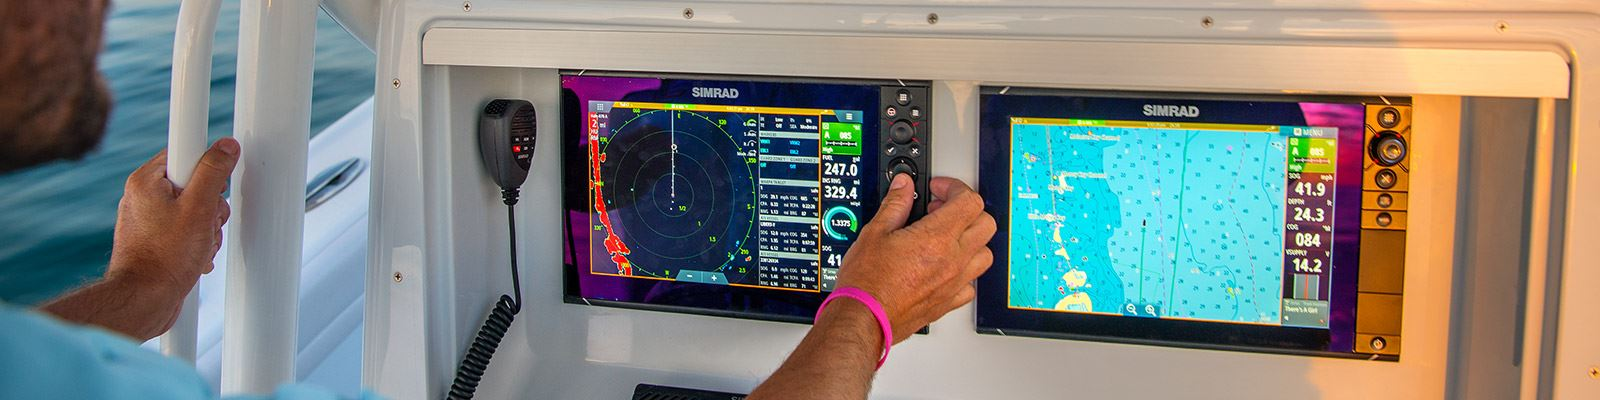 NSS12 evo3 with Insight charts & Broadband Radar | Simrad USA